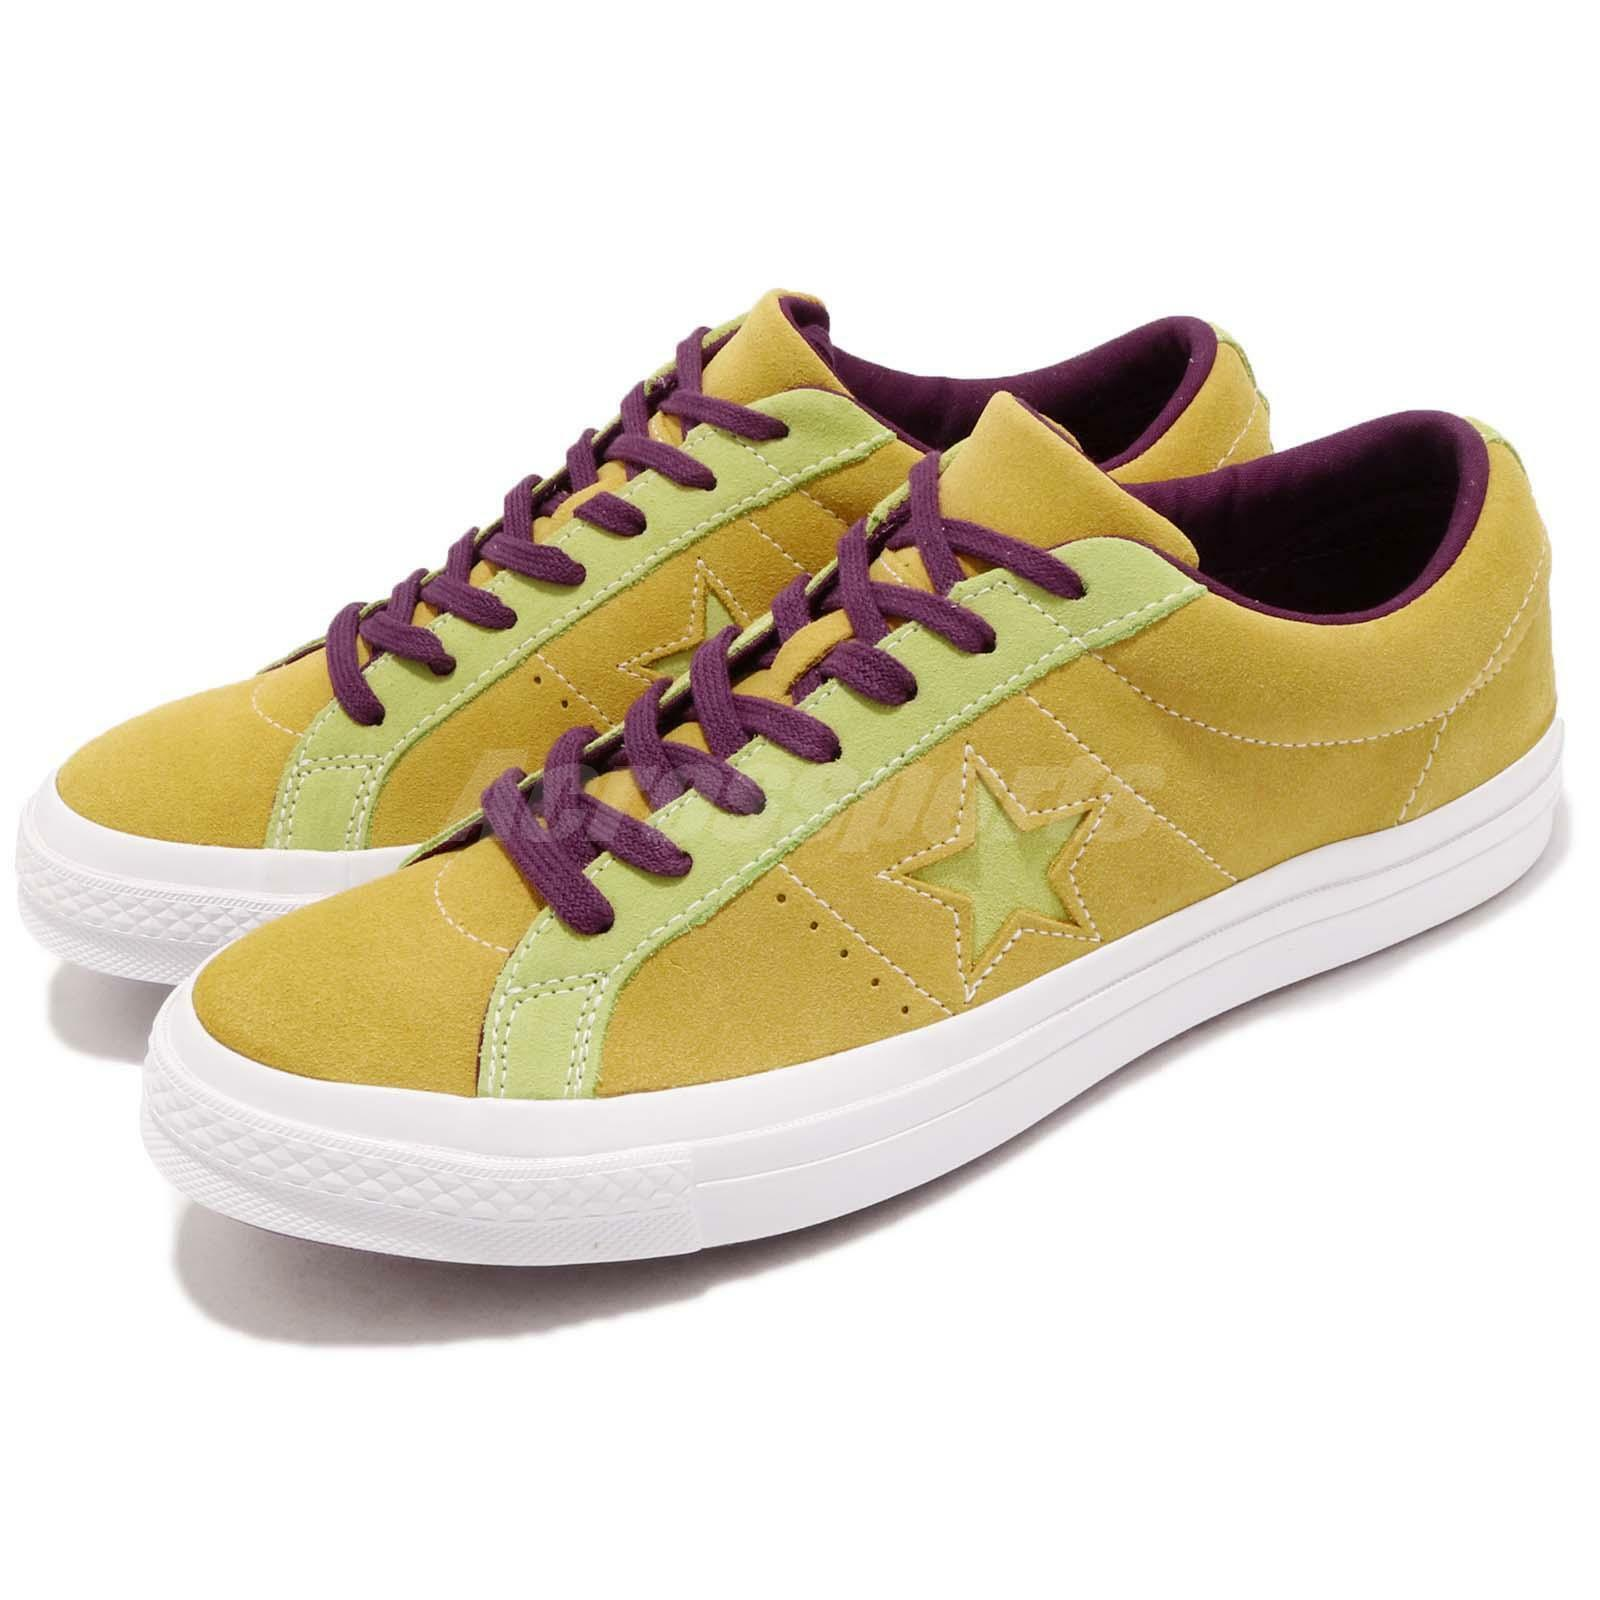 Converse One Star Yellow verde Purple Scarpe Suede Uomo Donna Shoes Scarpe Purple da Ginnastica 161616C 2234f0